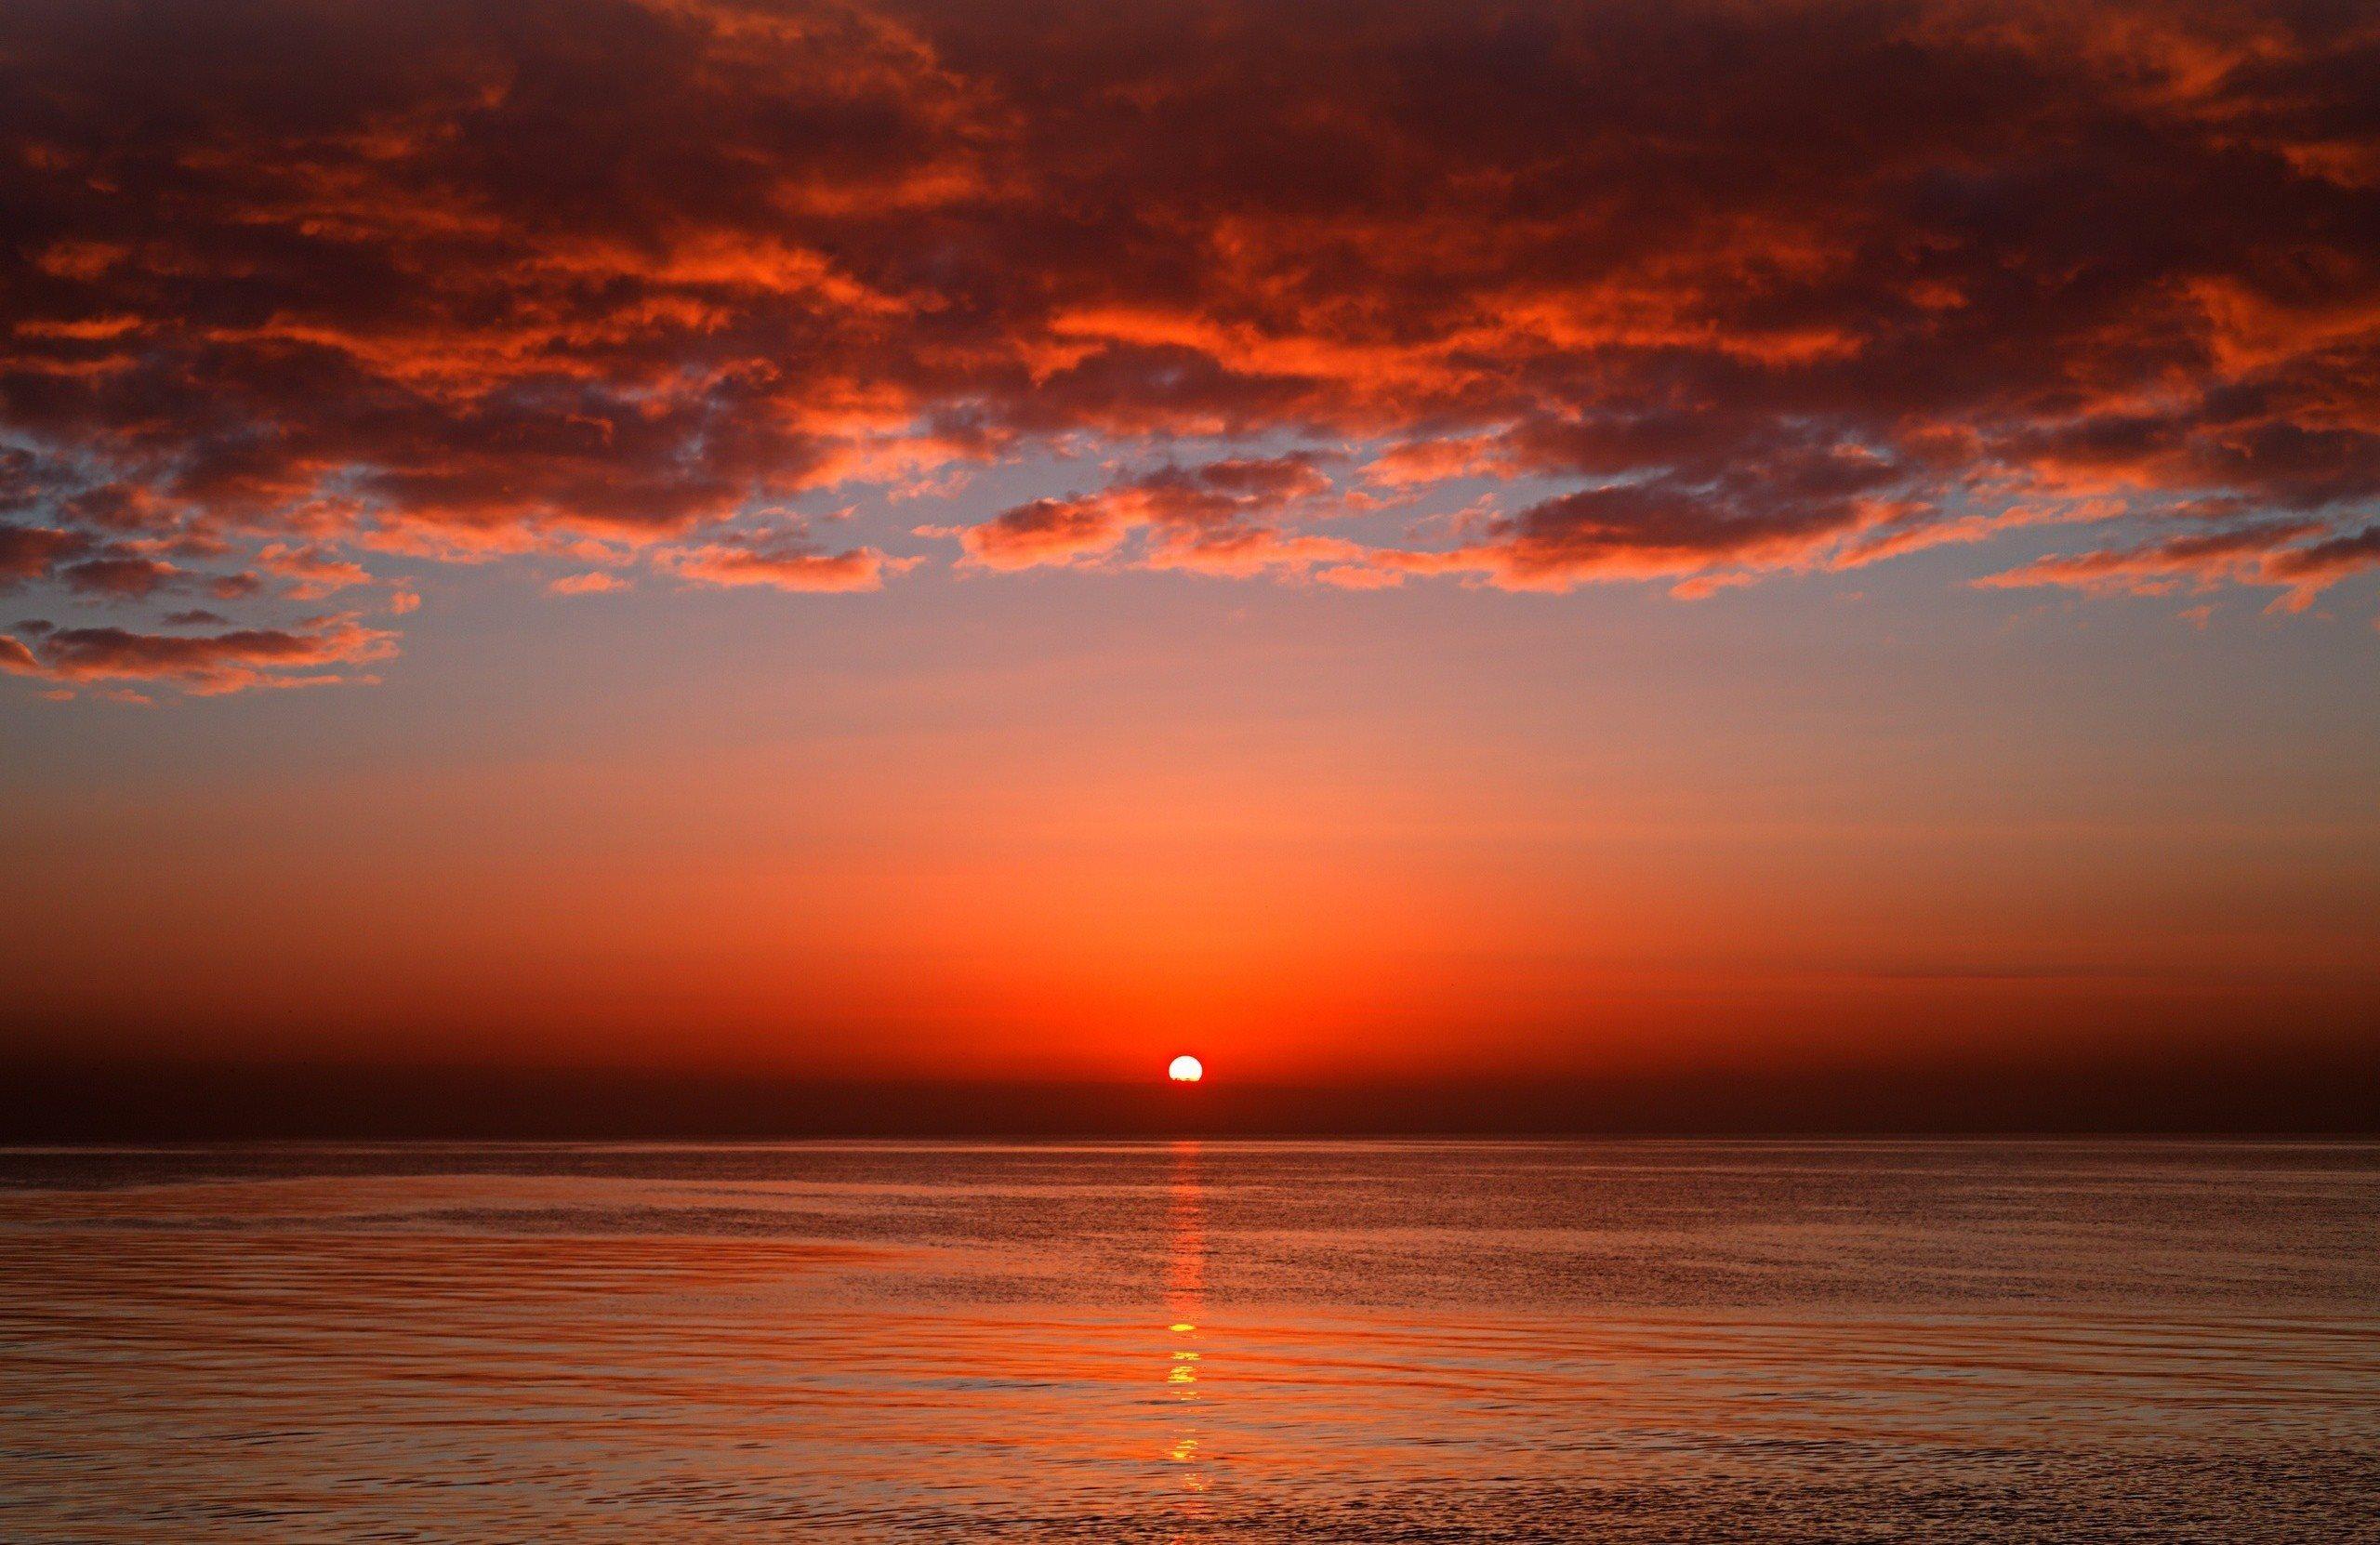 Open sunset wallpaper 2560x1662 for Sfondi desktop tramonti mare